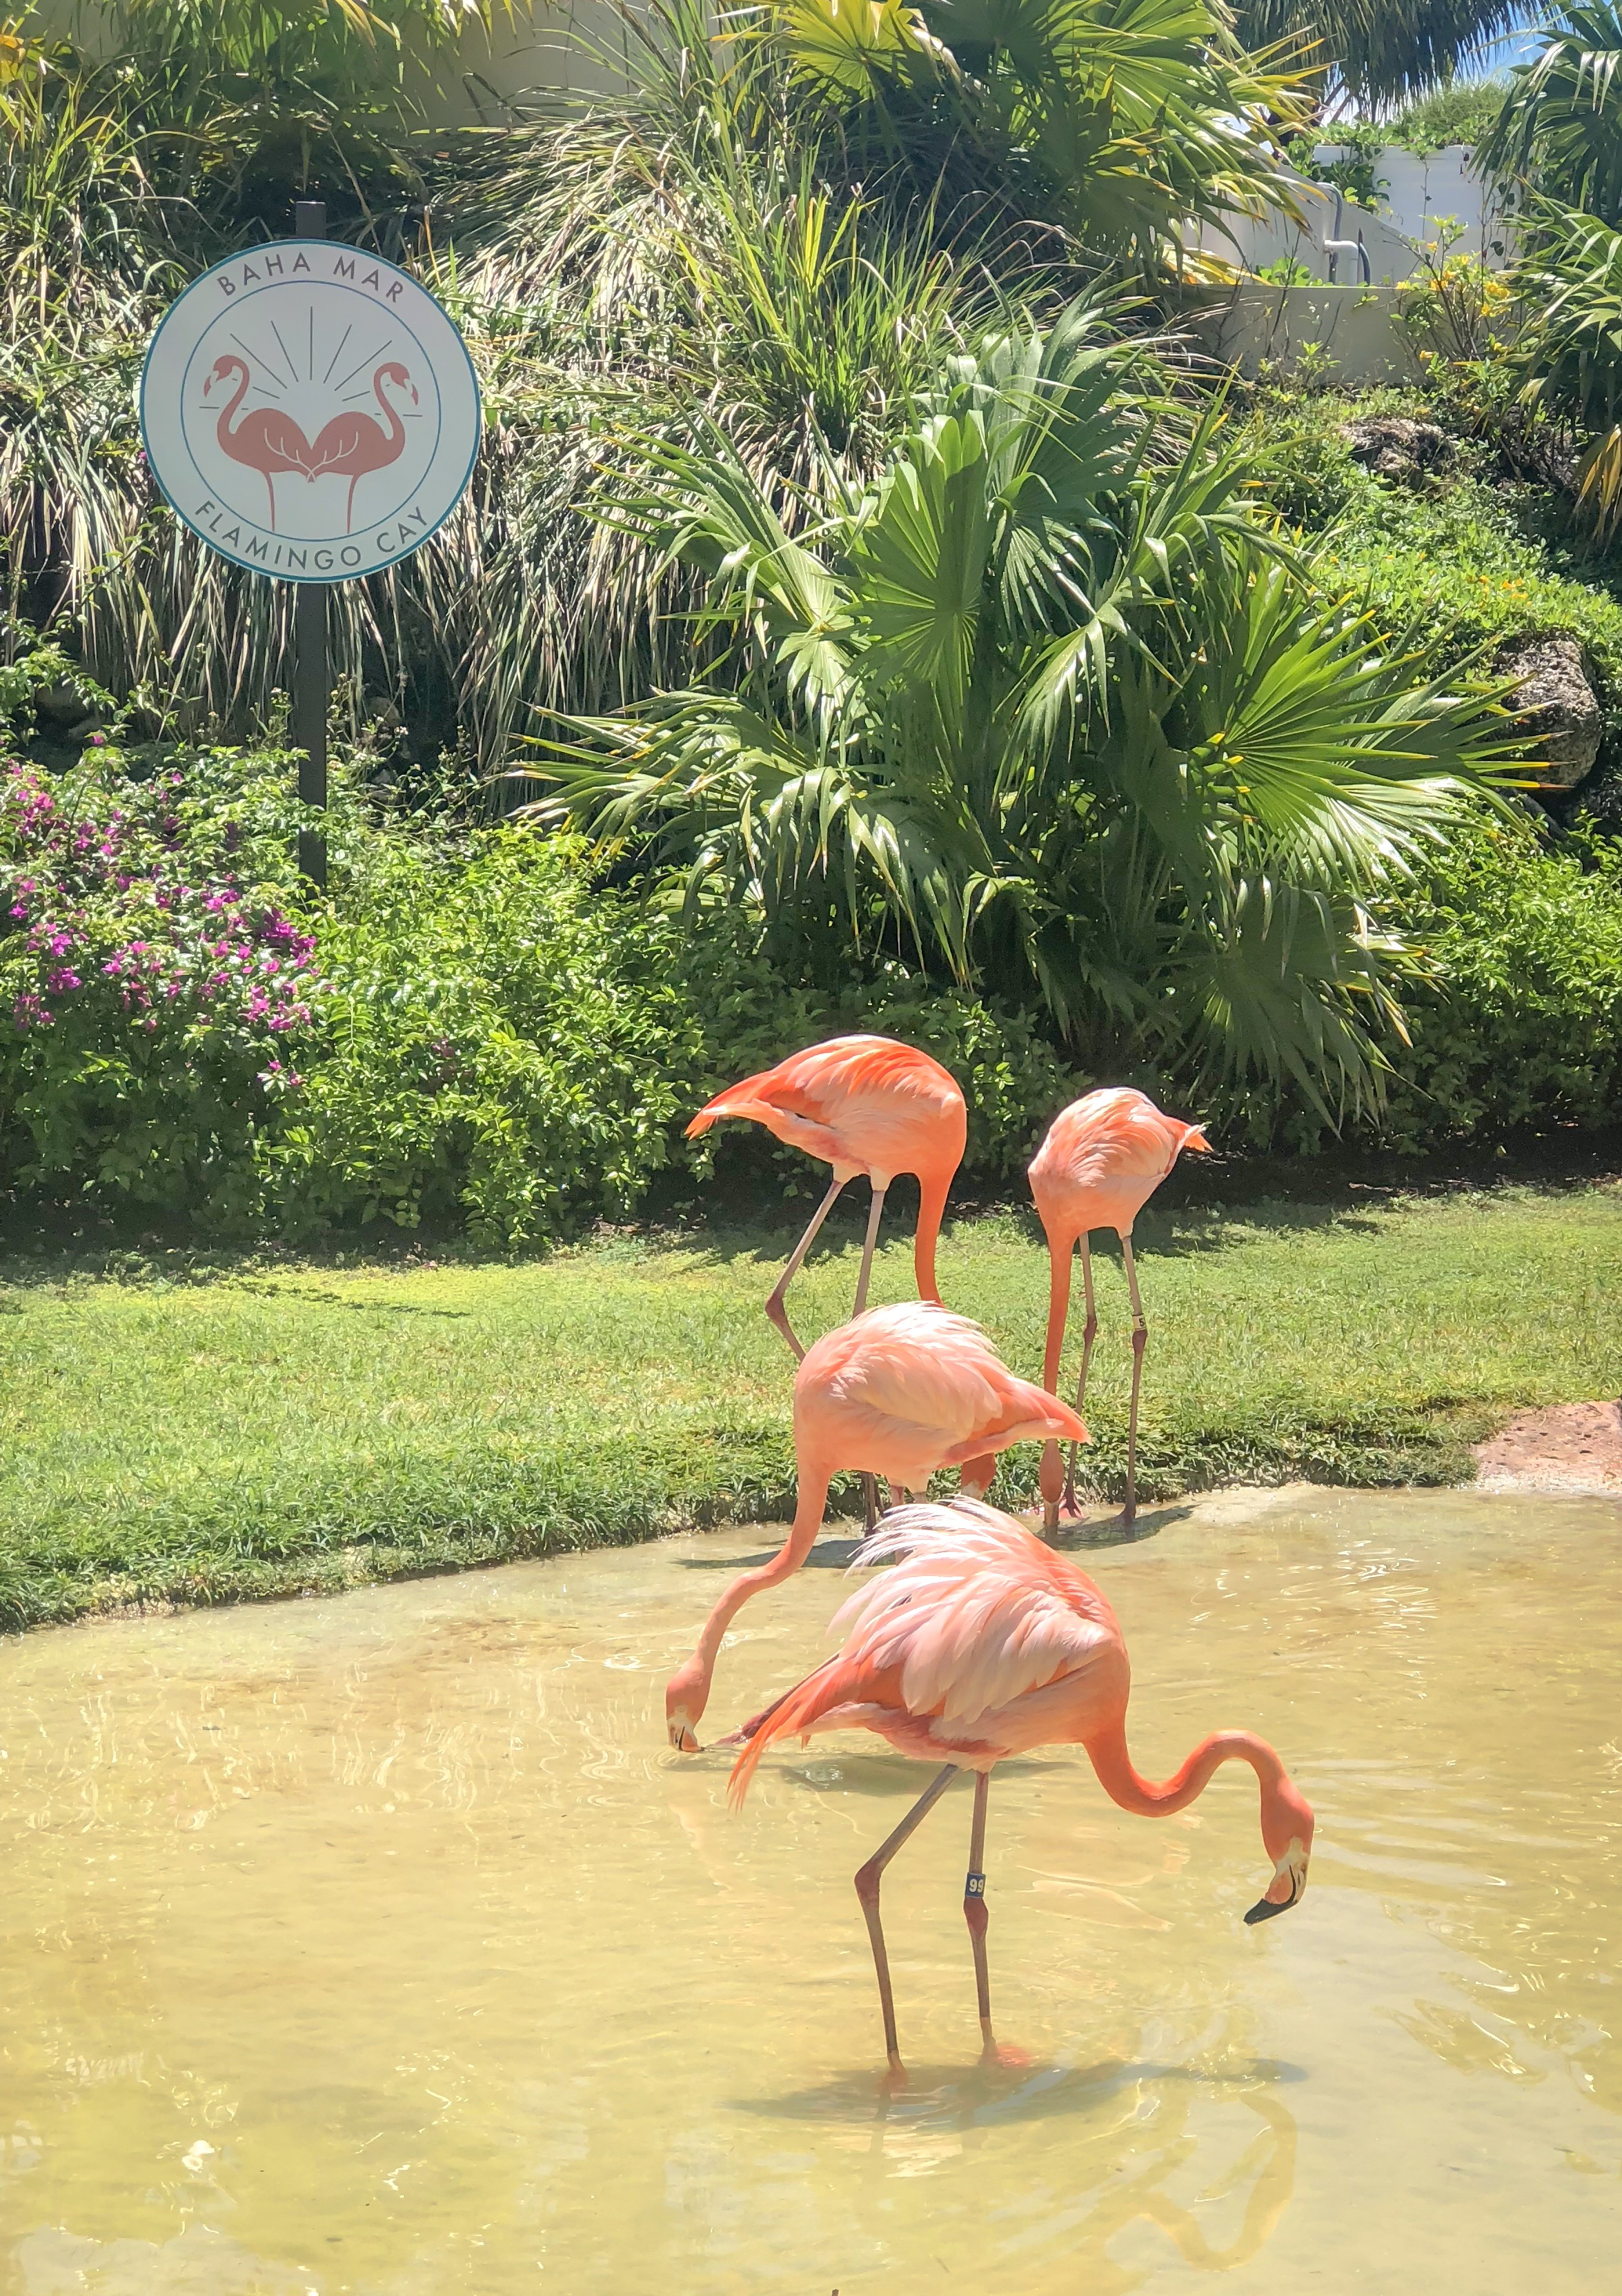 Baha Mar Flamingos www.caribbeansnowflake.com.JPG